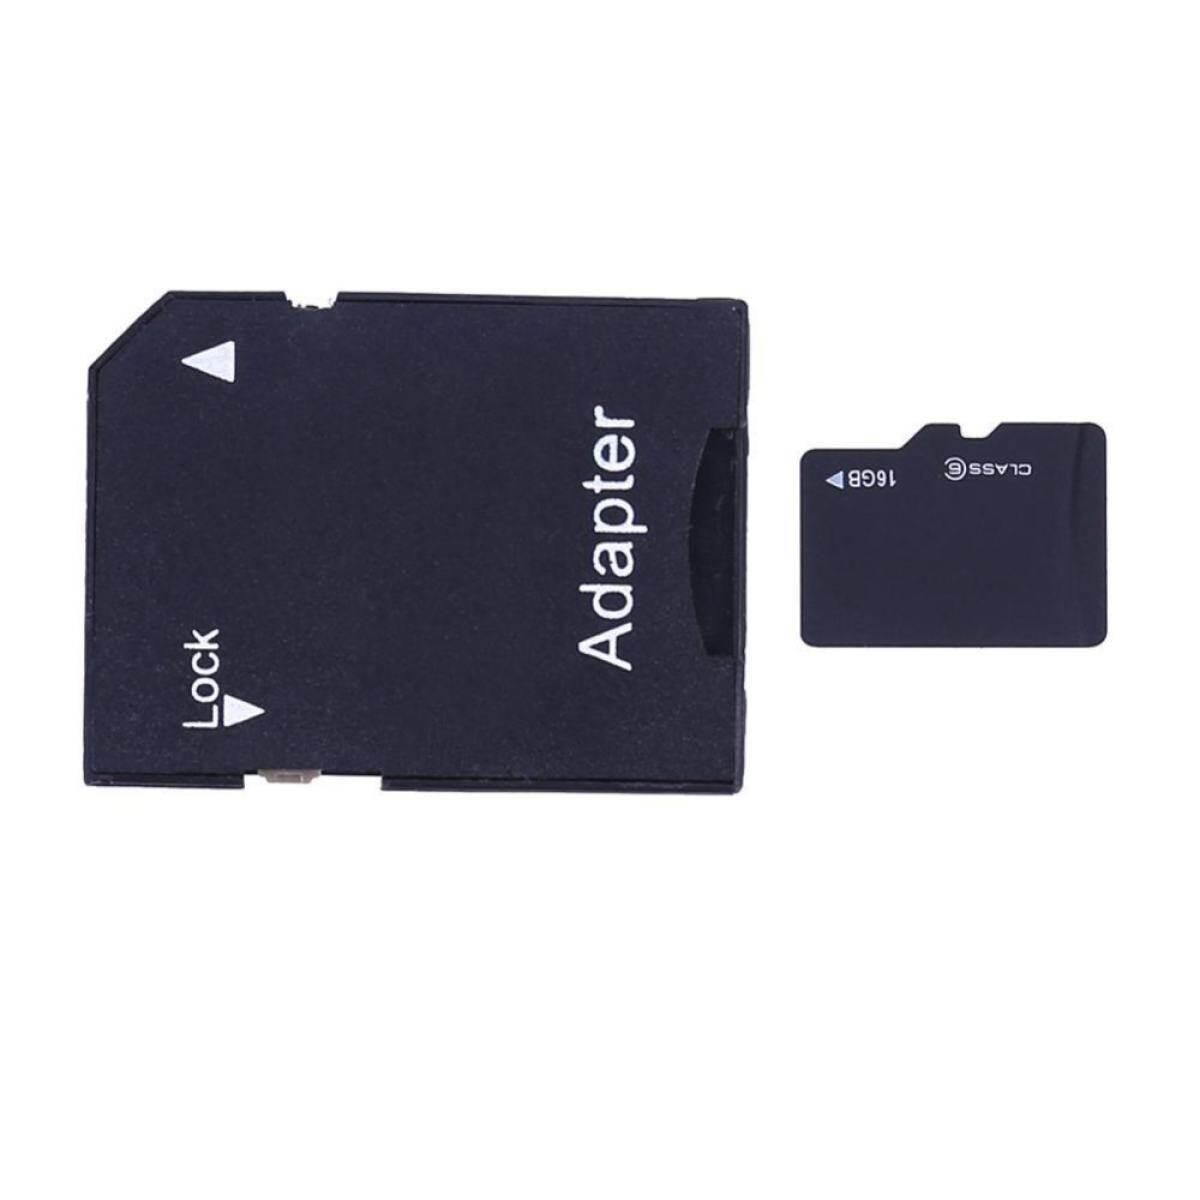 TF Card + SD Card Adapter + Mini Plastic Shell Card Reader (Random Color)